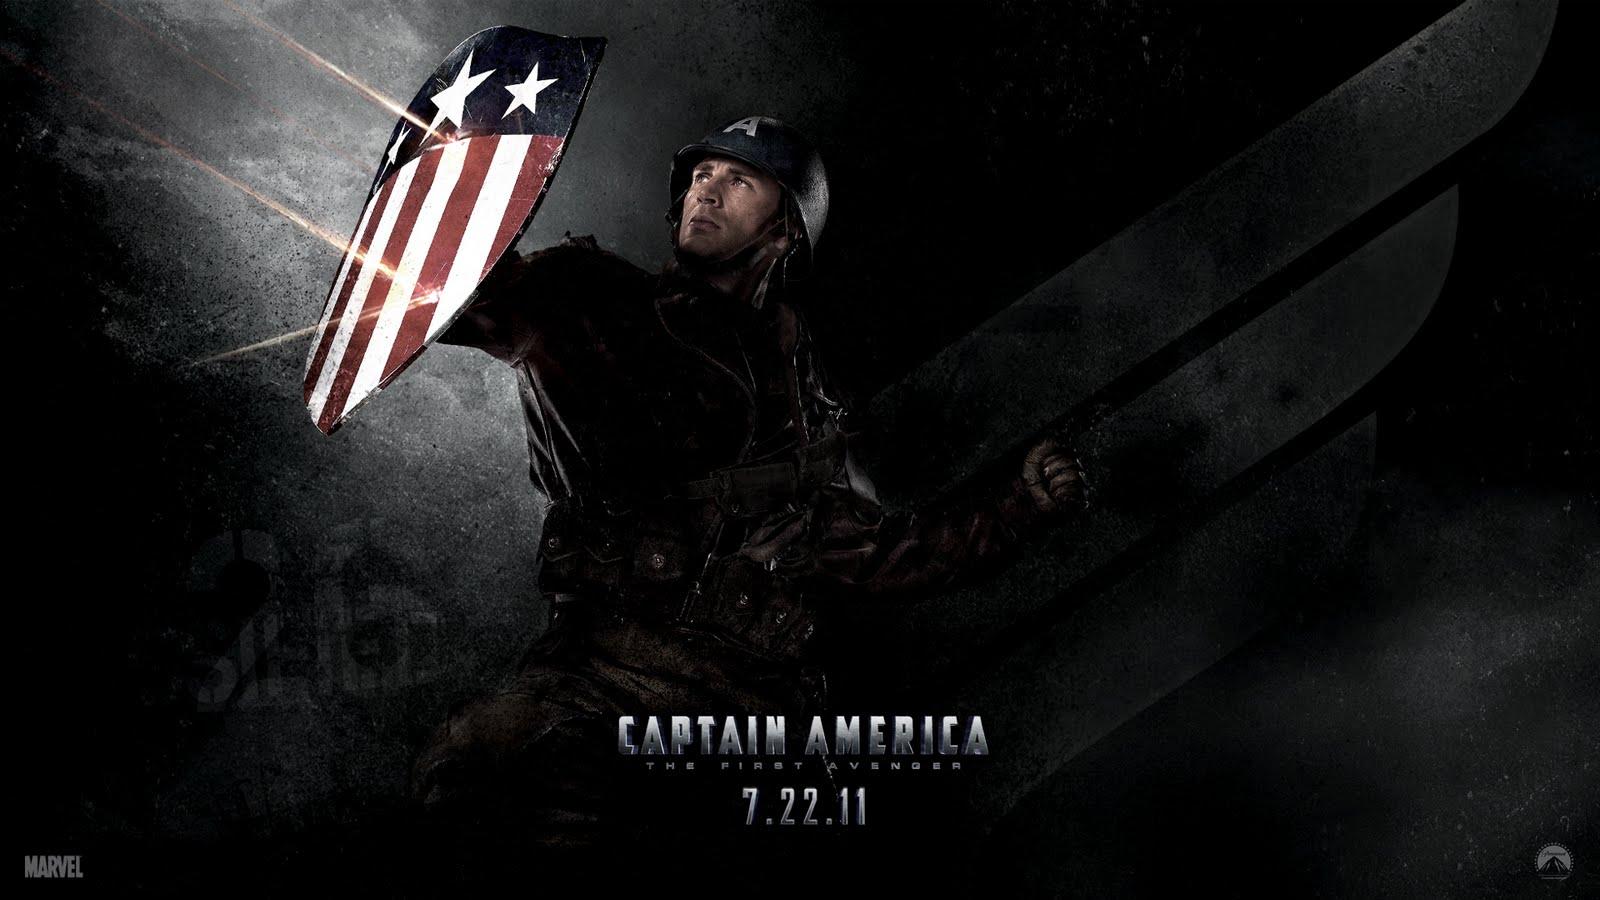 hd desktop wallpaper hd screensaver background captain america movie 1600x900